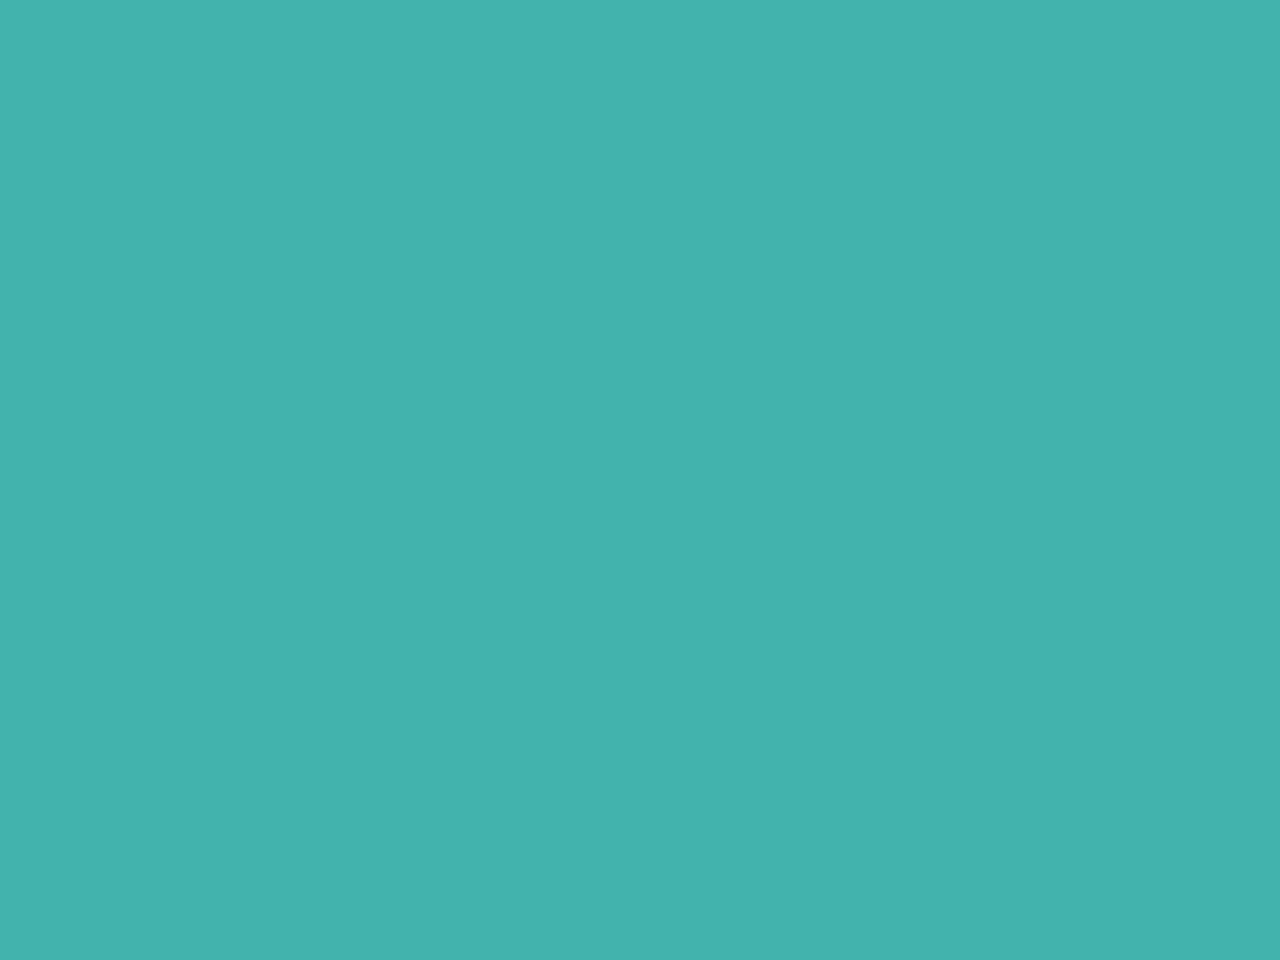 1280x960 Verdigris Solid Color Background